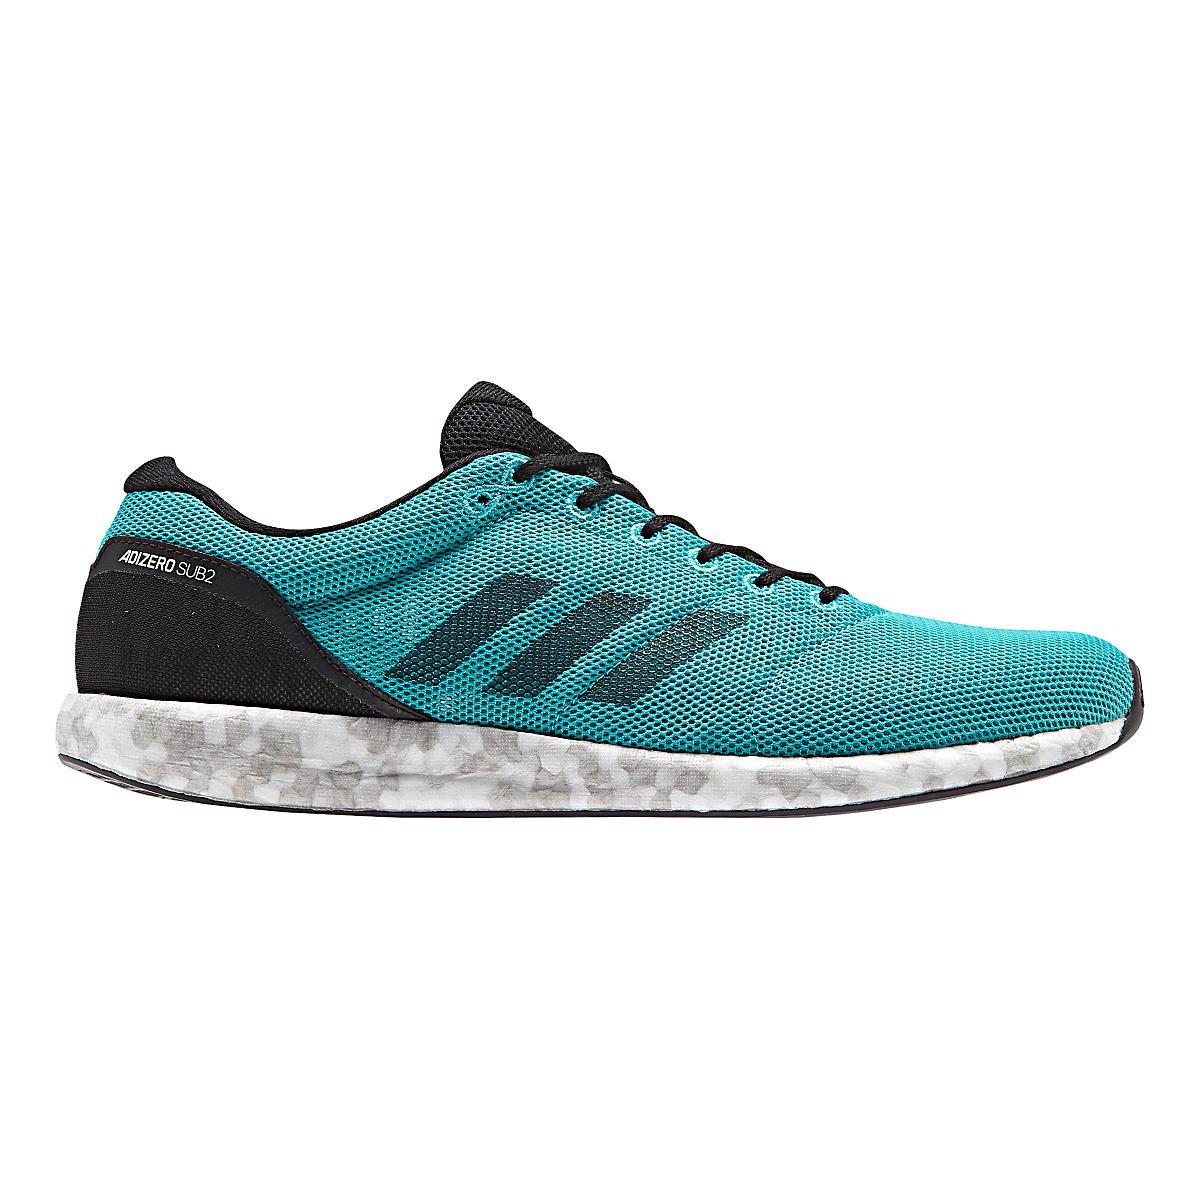 sports shoes 245b5 22c94 adidas adizero sub2 Running Shoe at Road Runner Sports